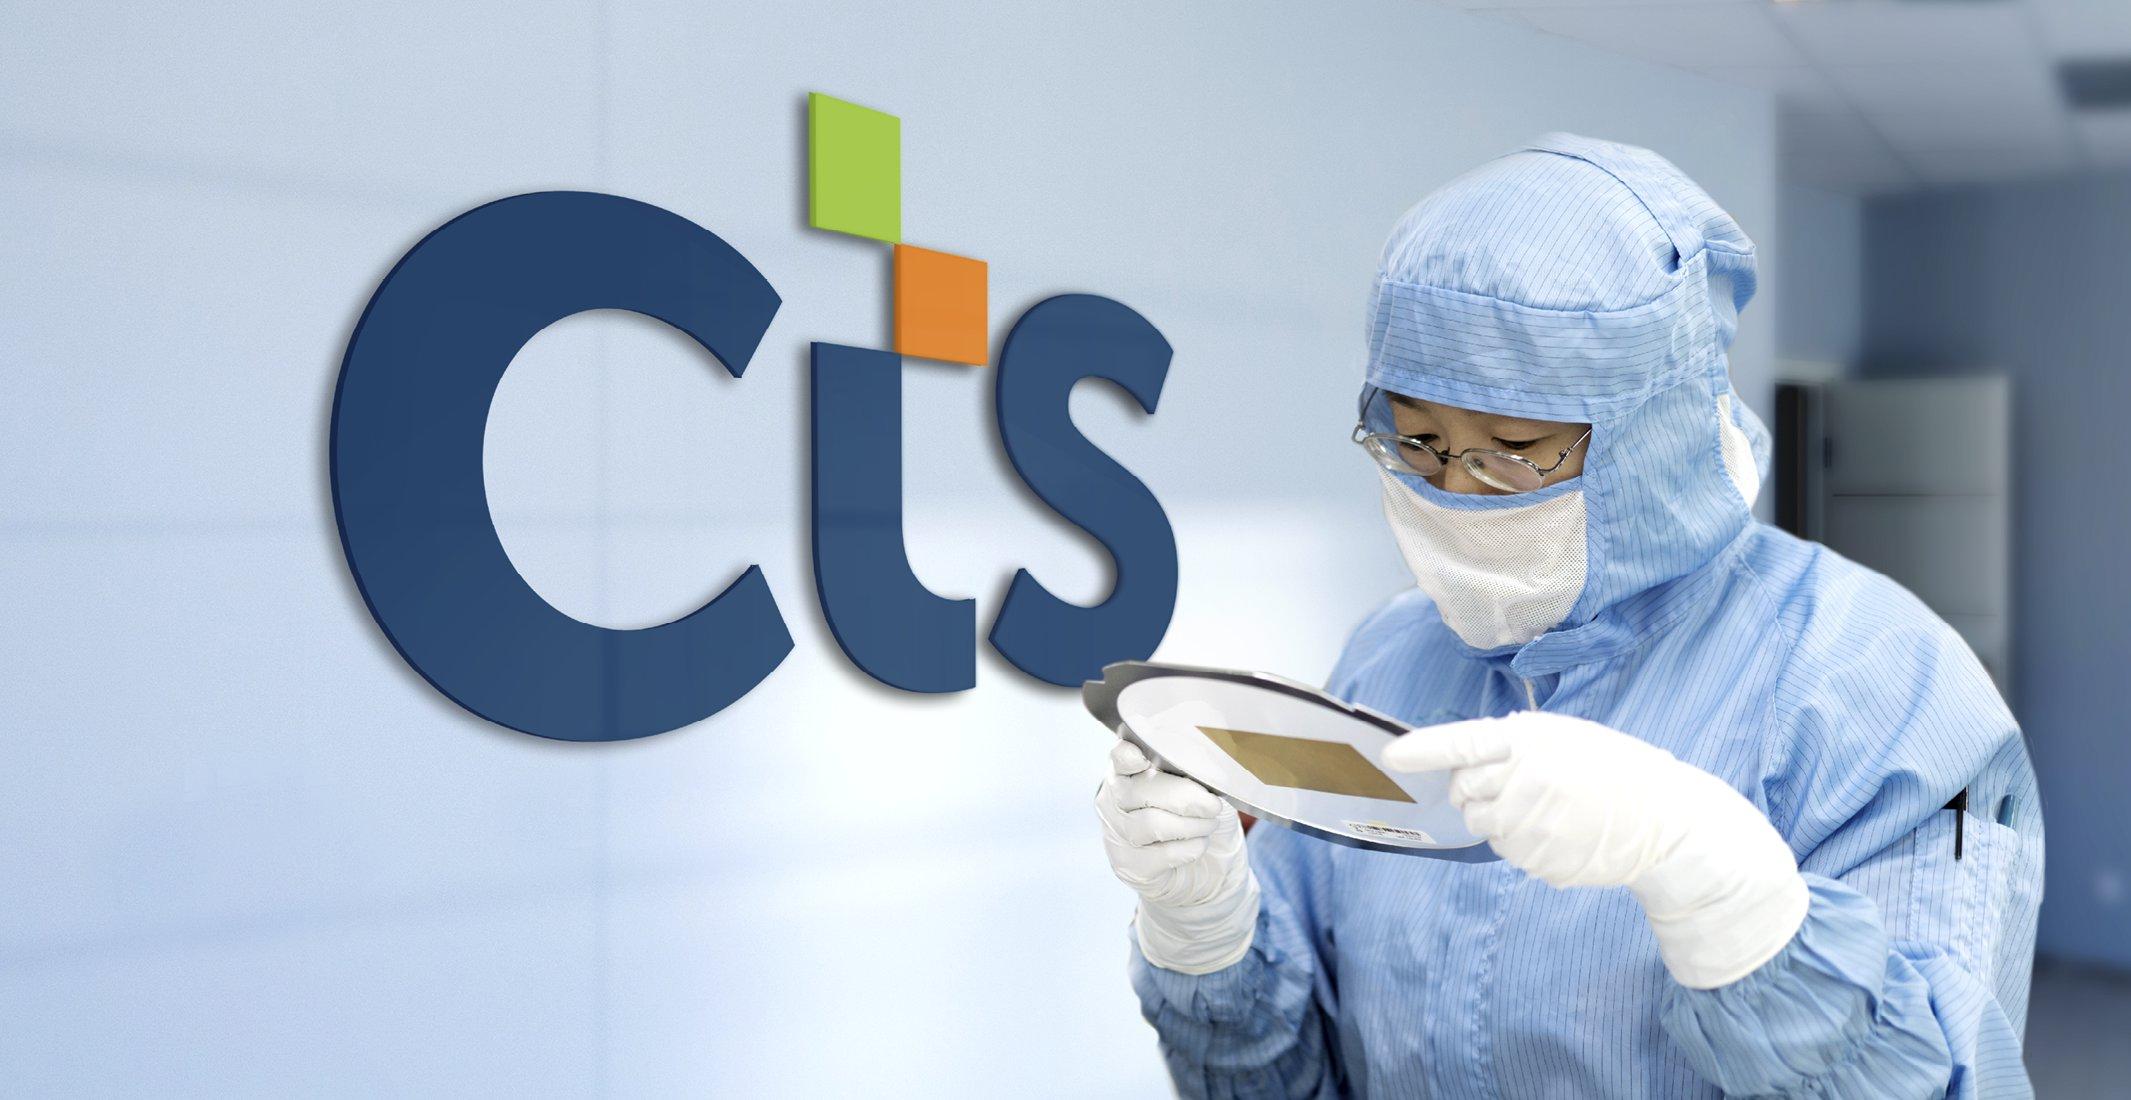 cts-case-study-image-1